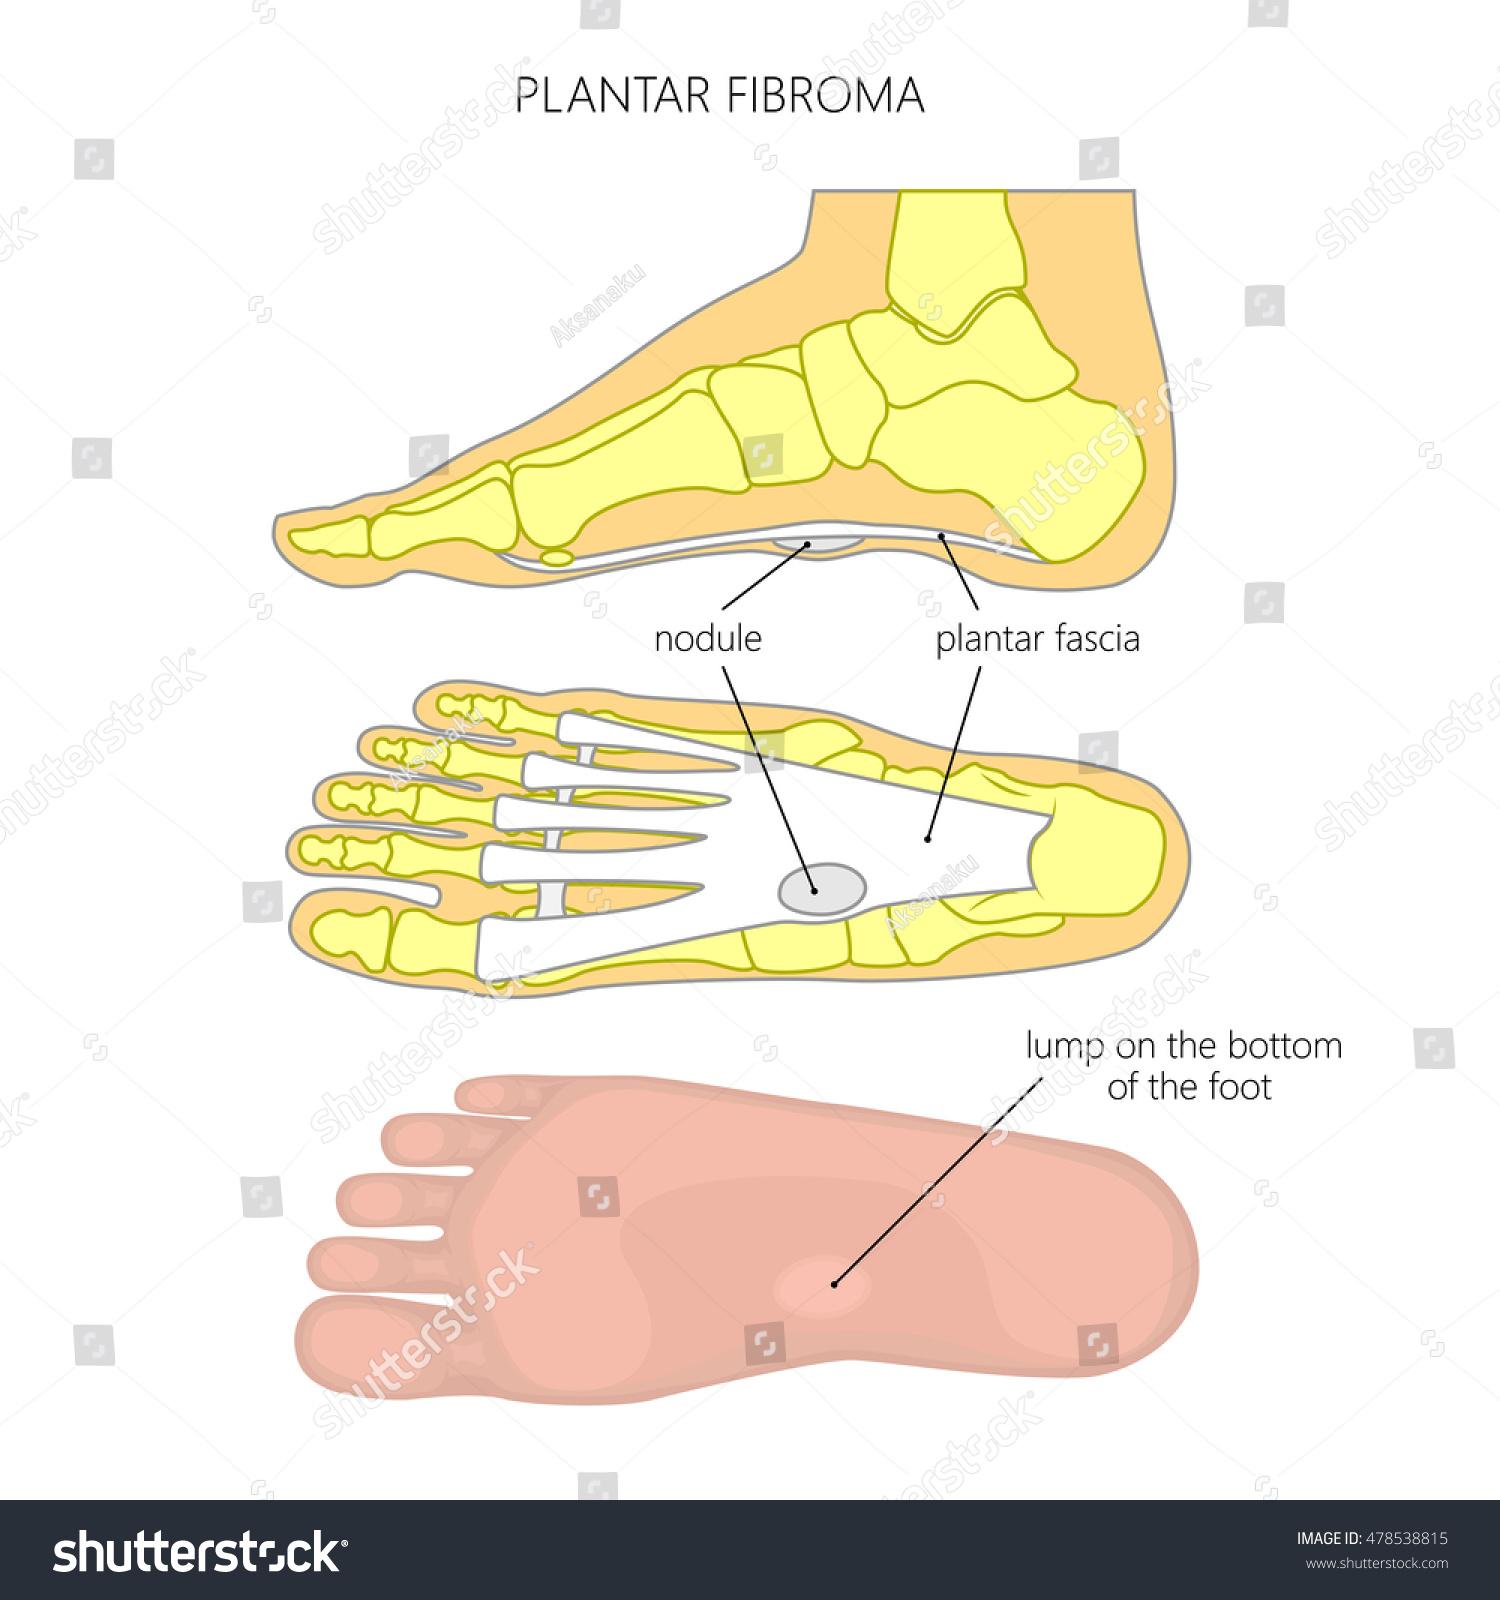 Vector diagram plantar fibroma fibromatosis tumor stock vector vector diagram of plantar fibroma or fibromatosis tumor on the plantar fascia of an ankle pooptronica